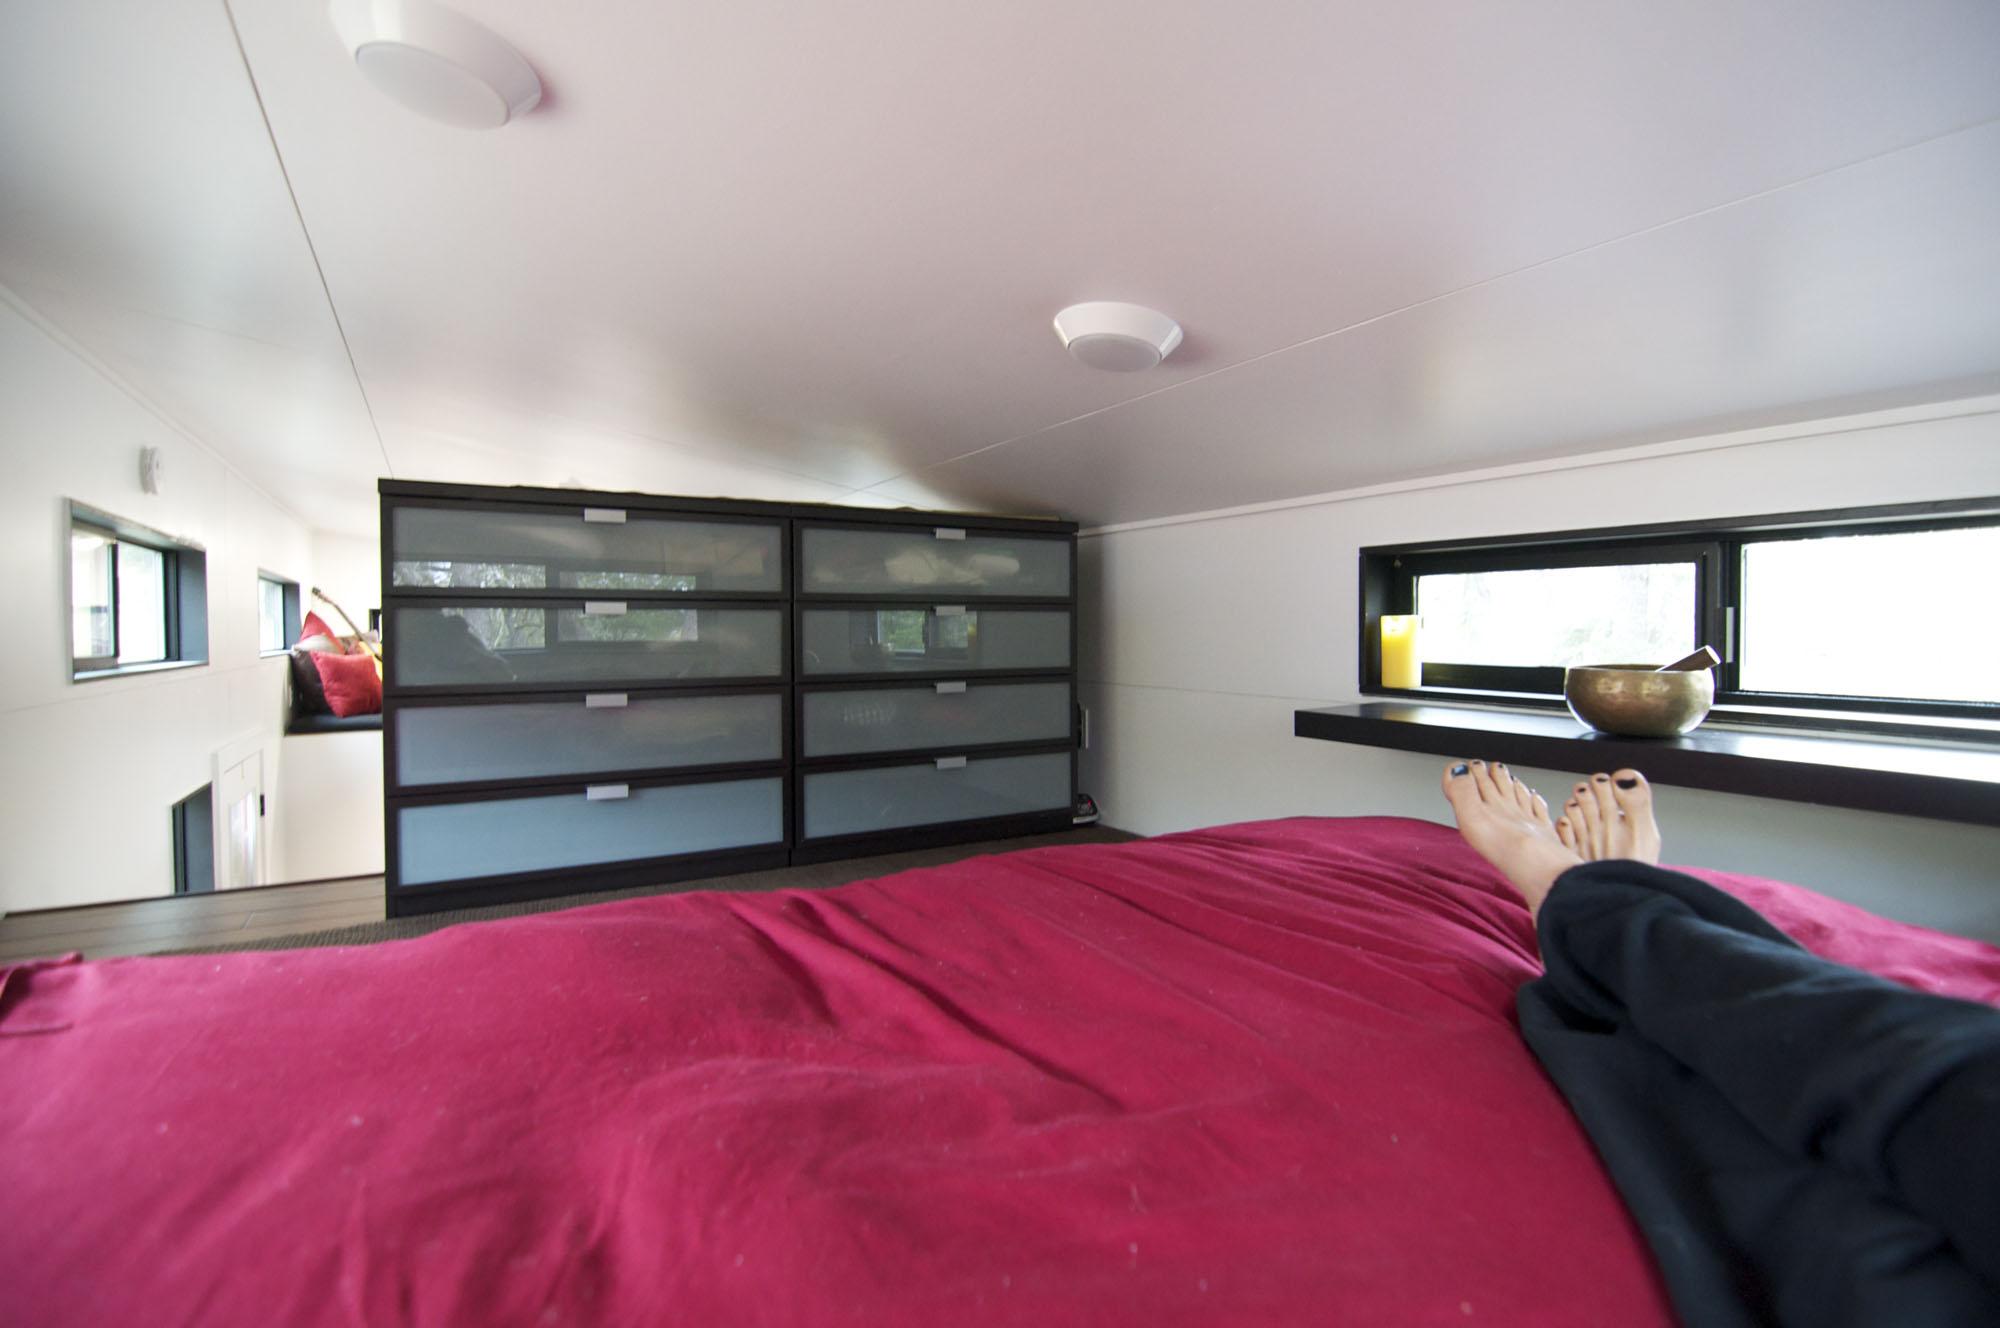 Bedroom, Storage, Tiny House on Wheels